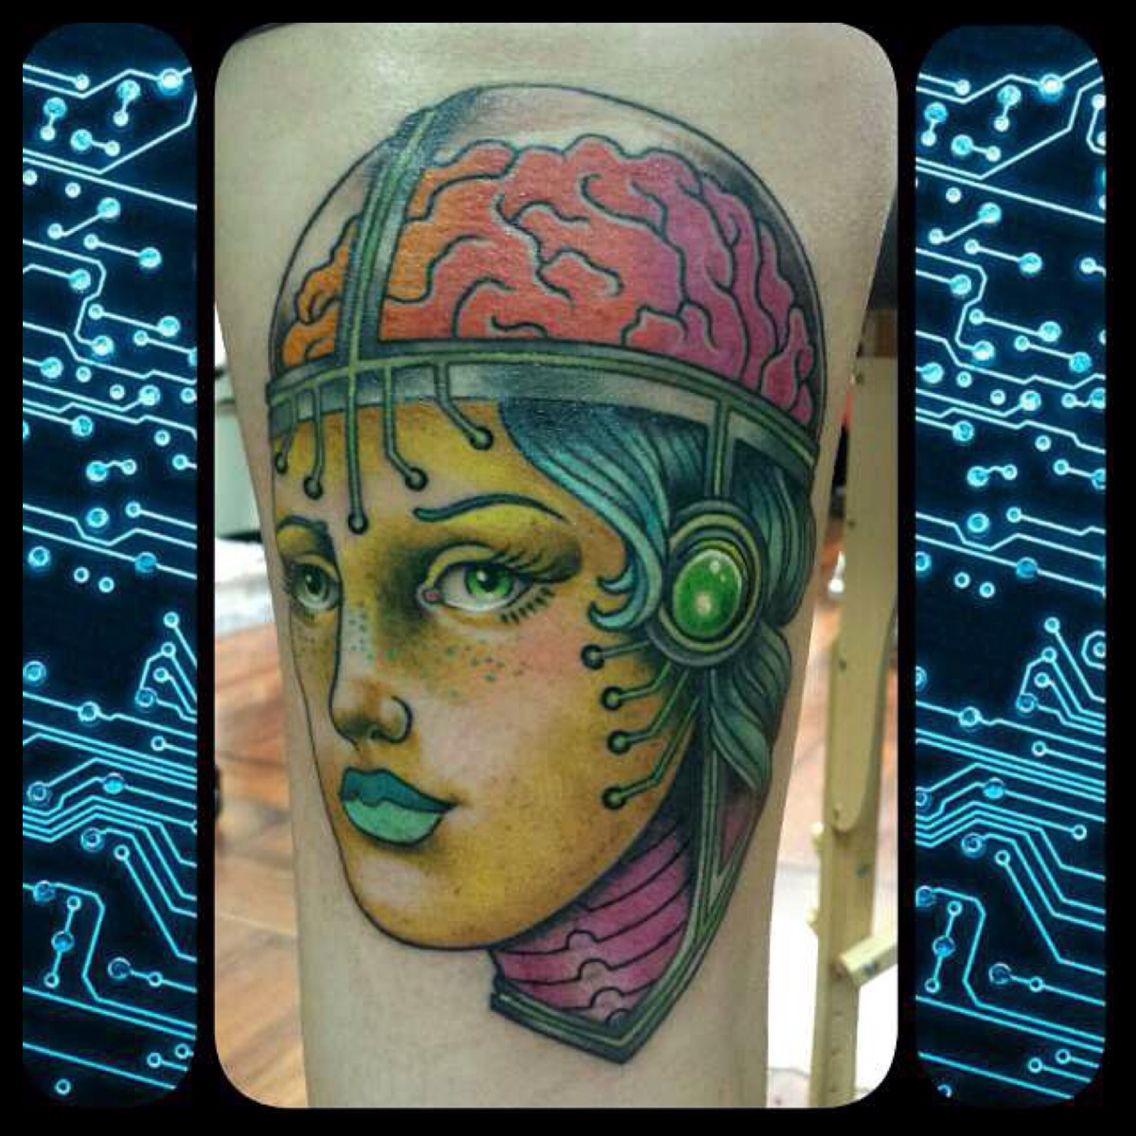 Fredericksburg virginia tattoo artist mike tschirn